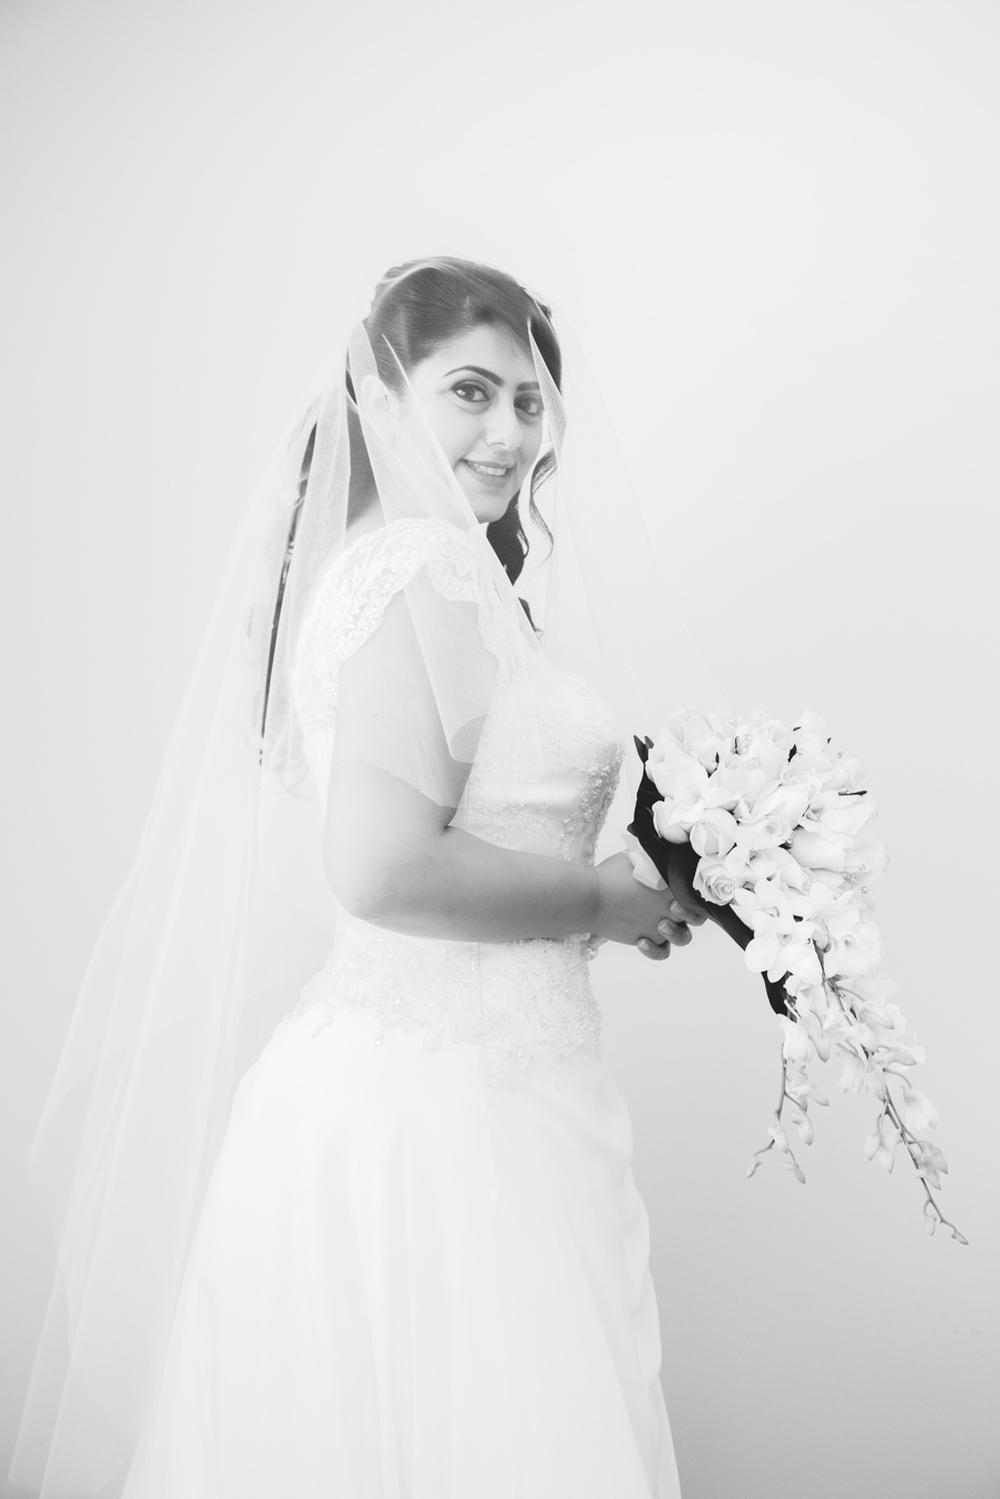 MandyAndPhillip IMAGE 011 - 151.jpg